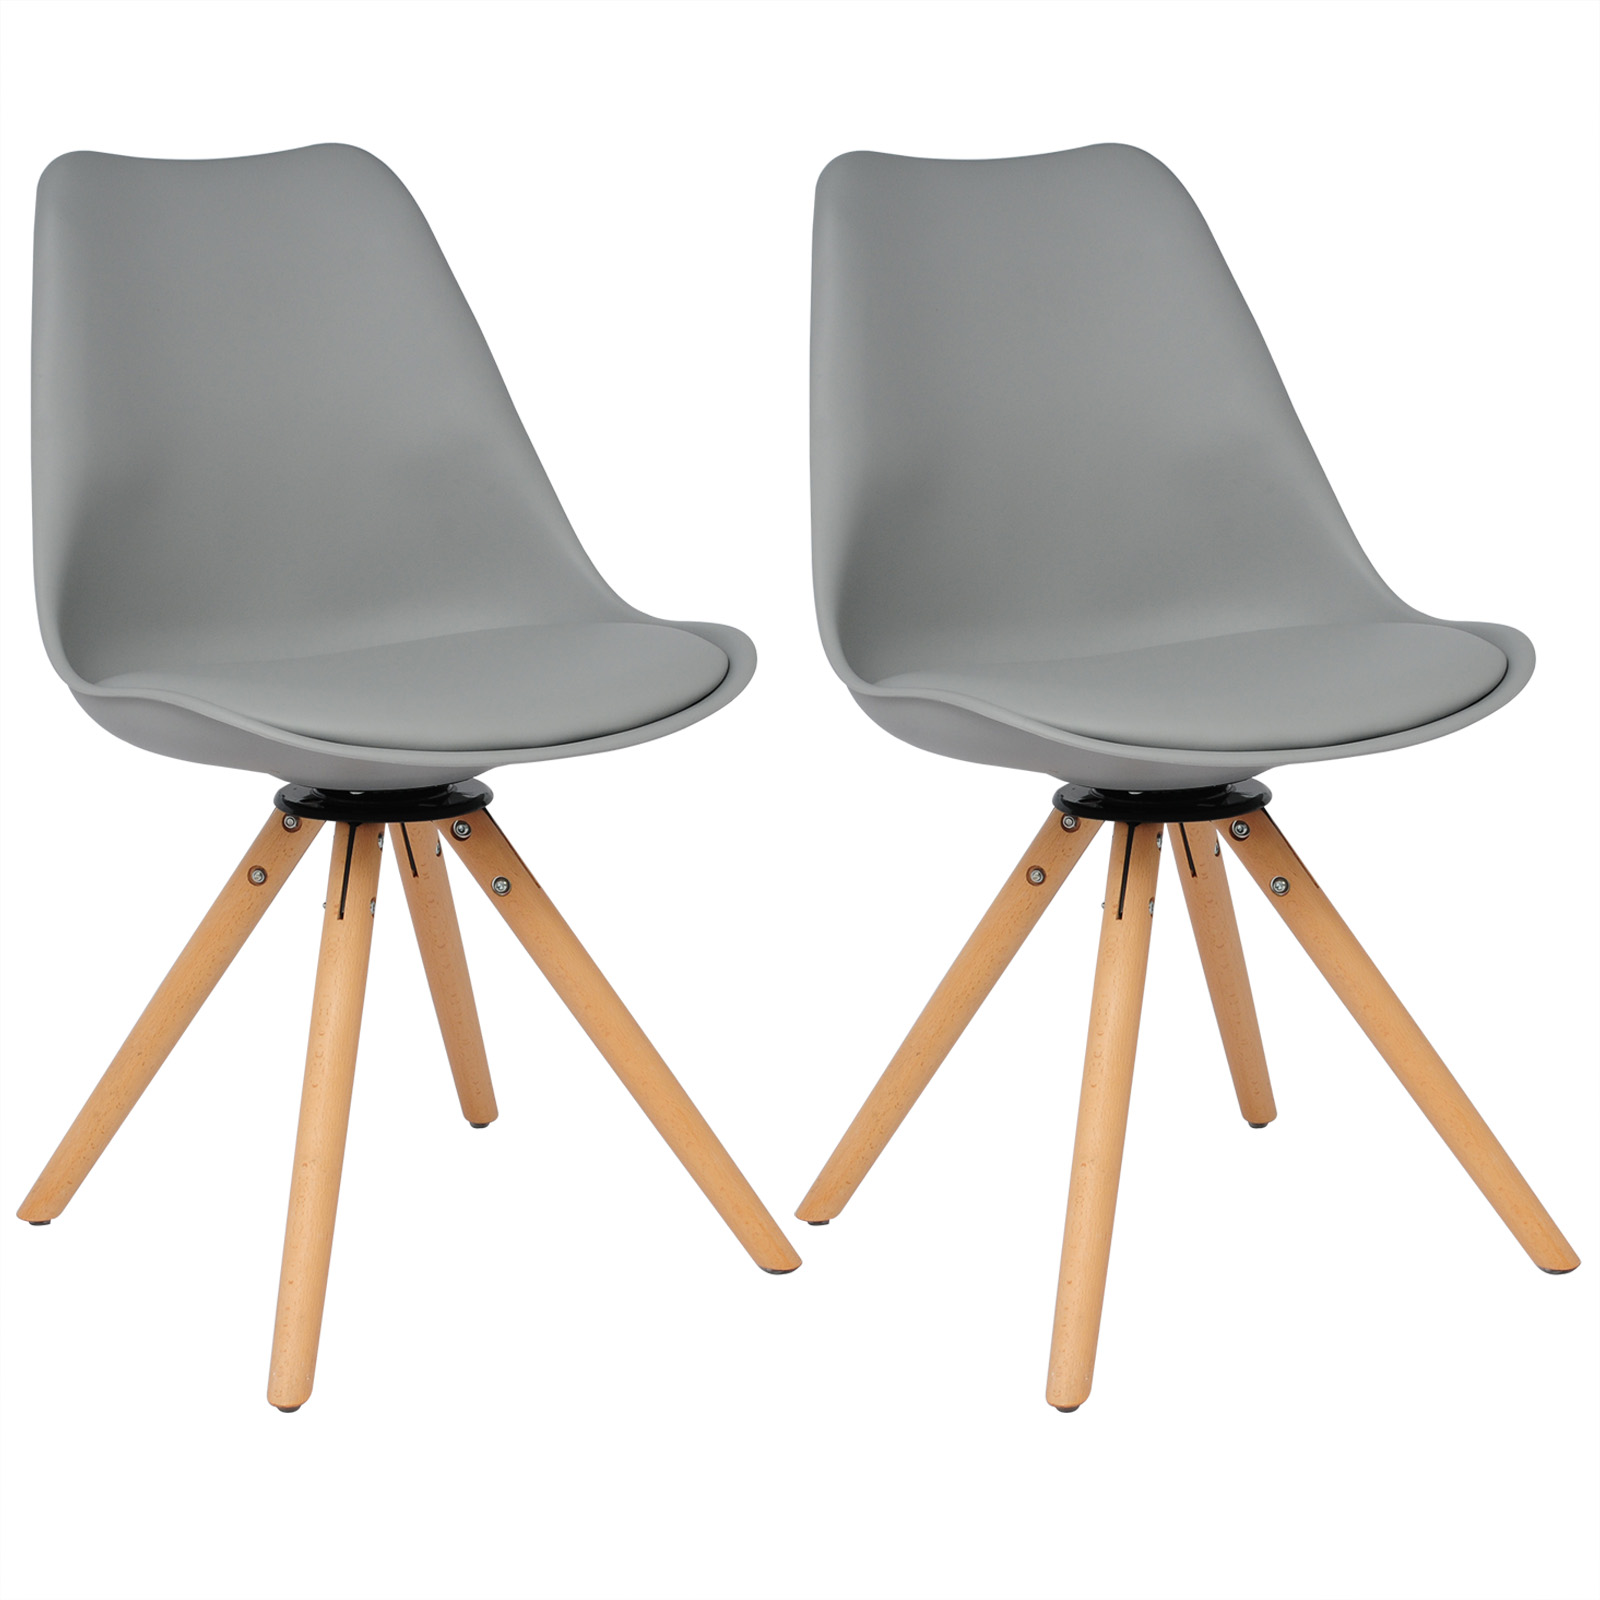 2 X Esszimmerstuehle Esszimmerstuhl Holz Design Stuhl Kuechenstuhl